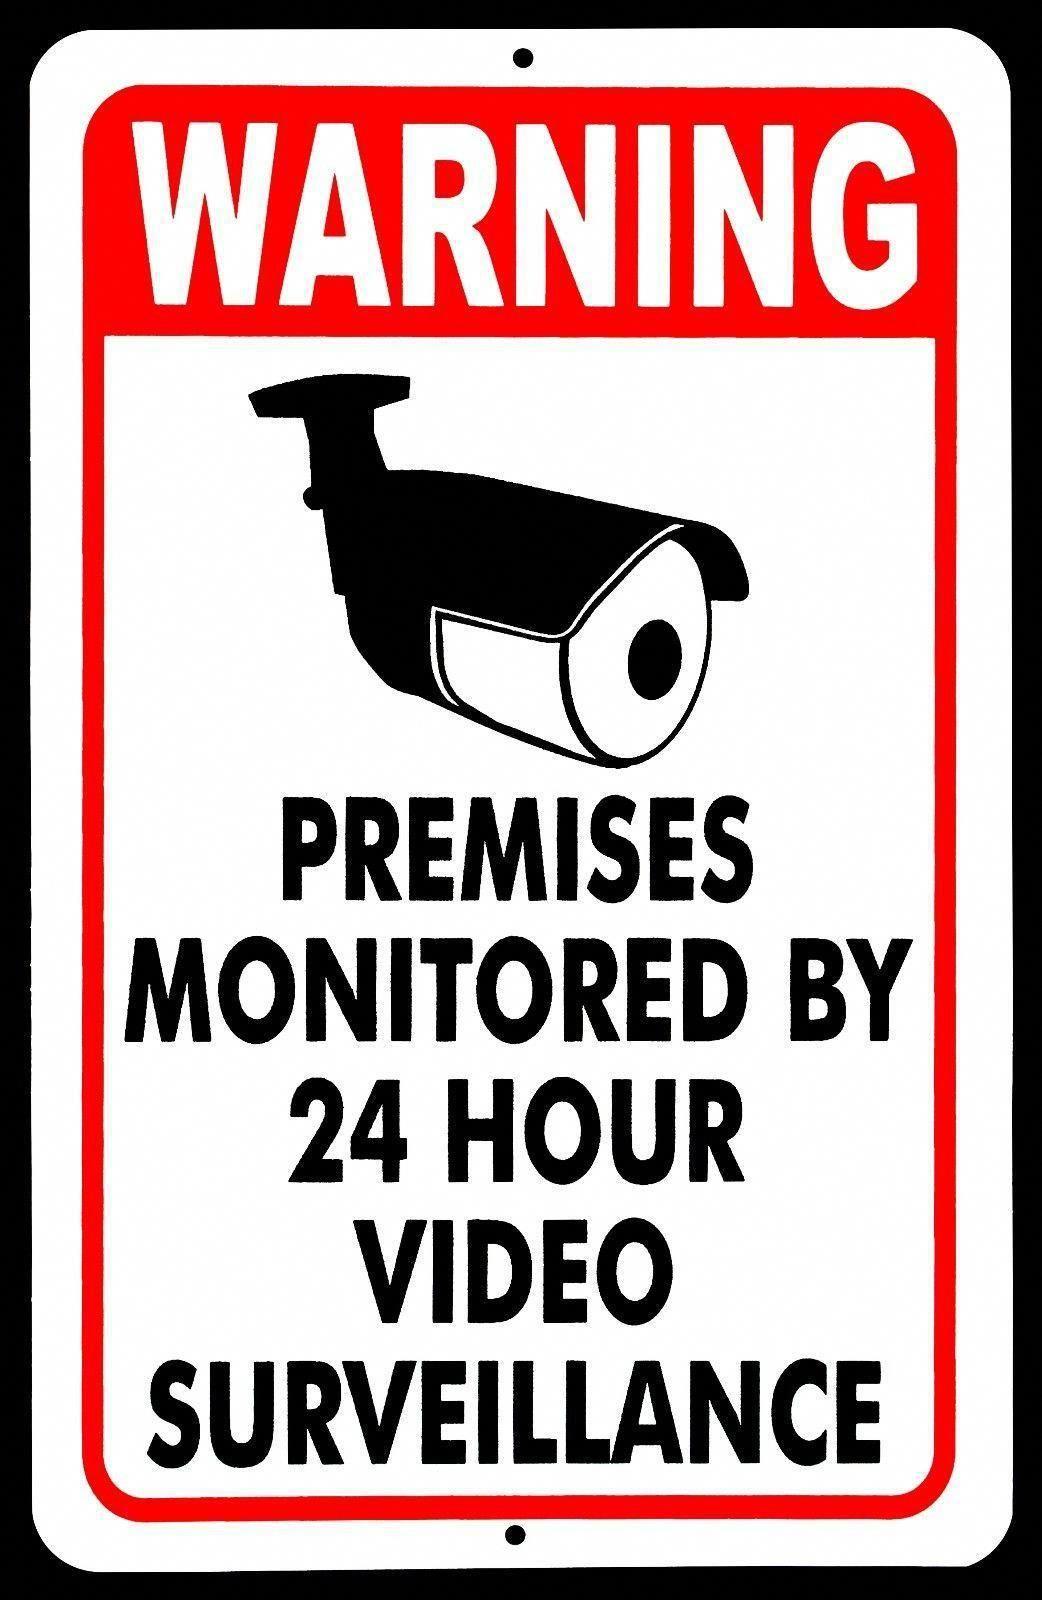 Warning Video Surveillance Sign Video Monitor Sign under